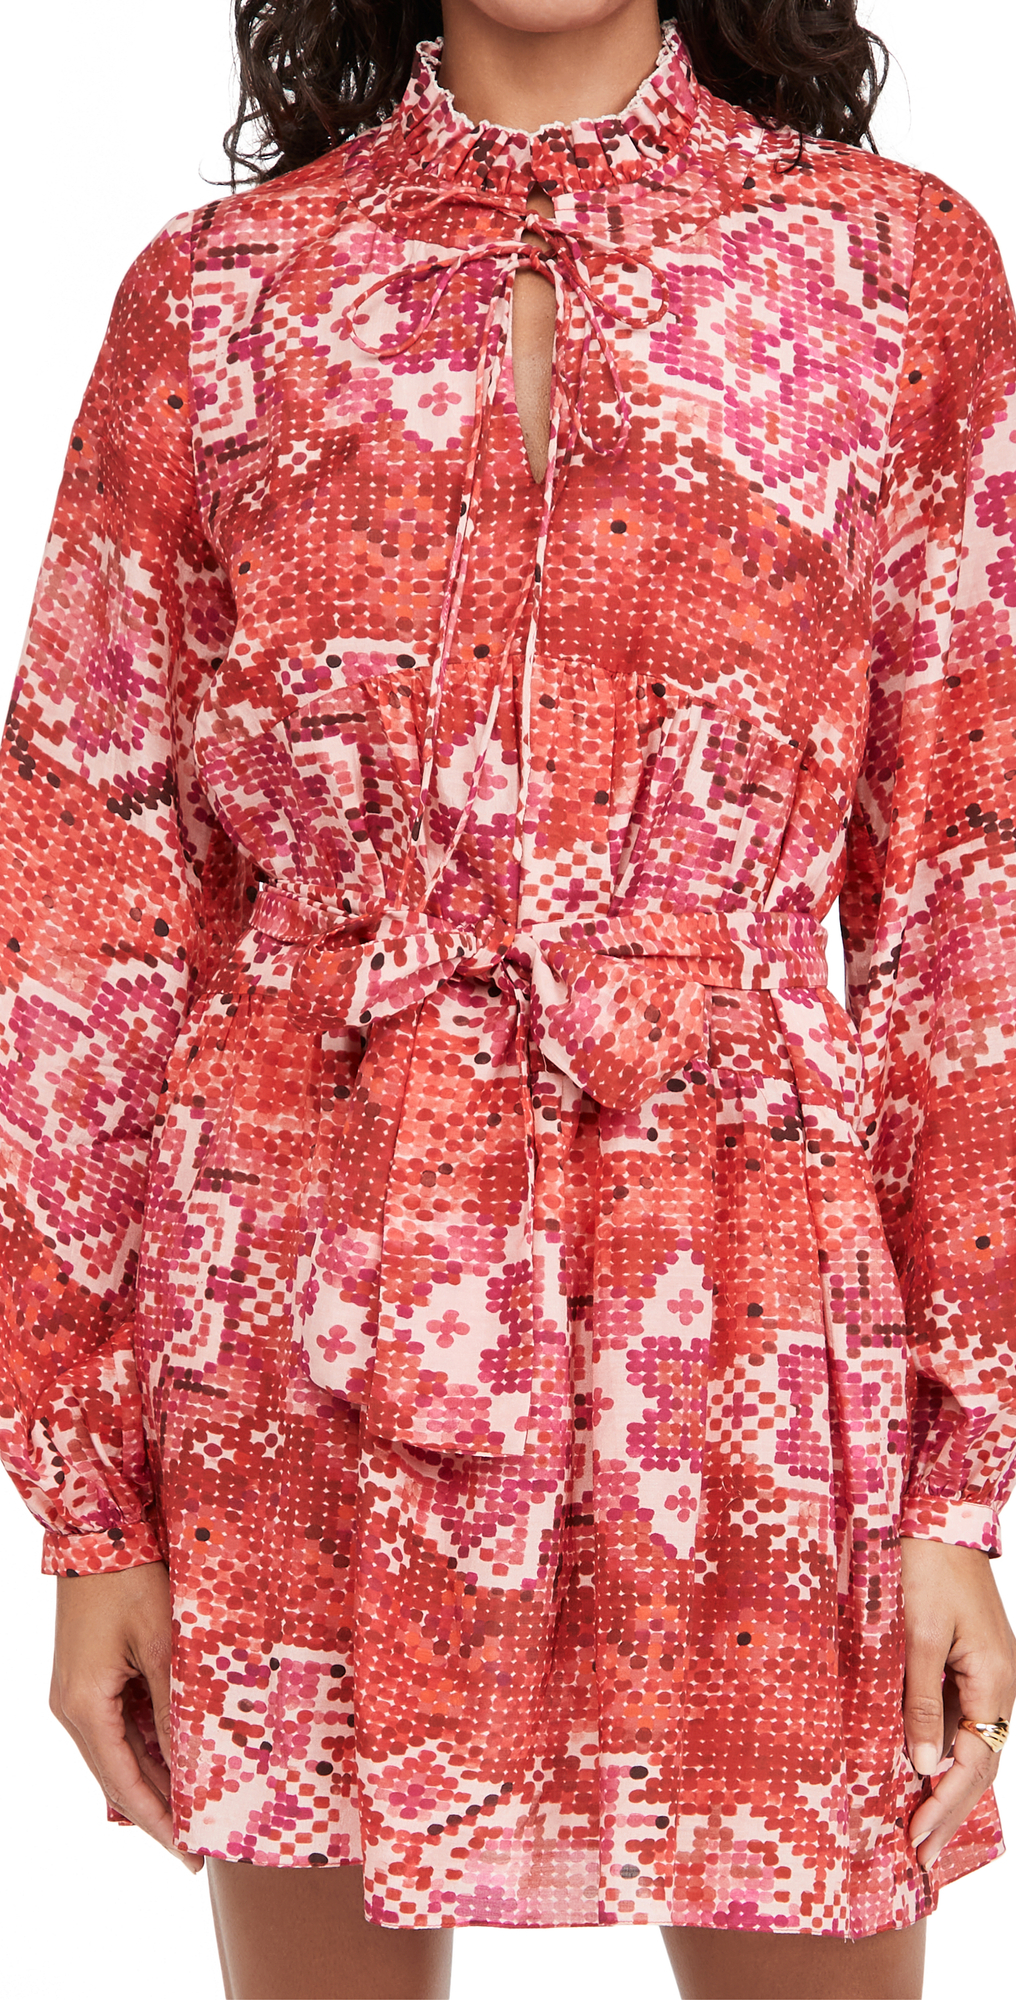 Lidia Mini Dress